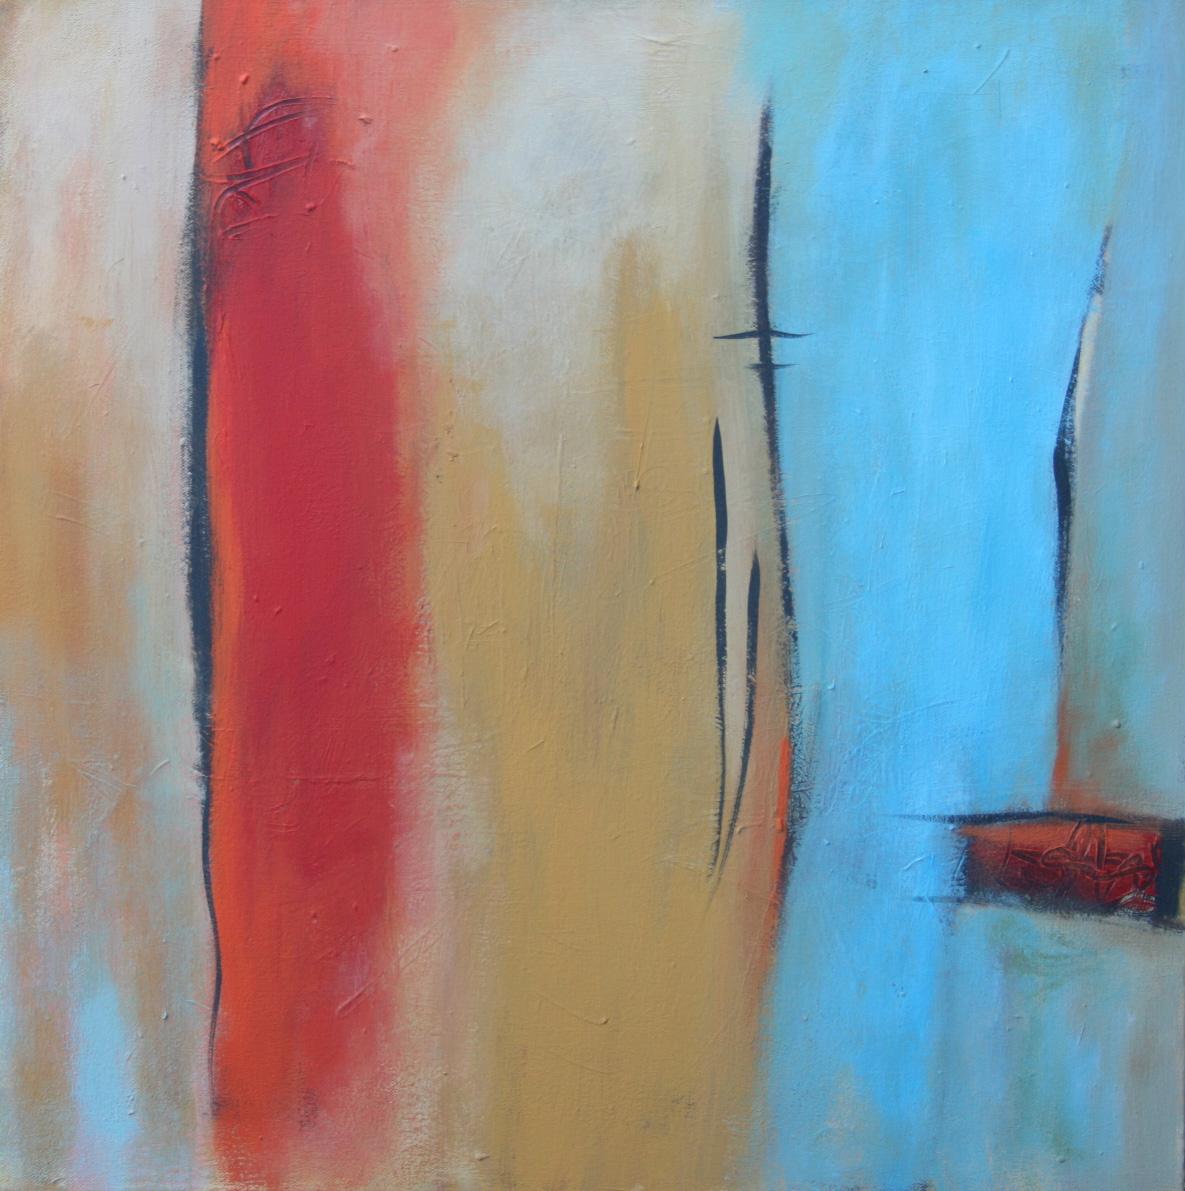 Wo ist das Meer I, Öl und Acryl auf Leinwand, 60 x 60 cm